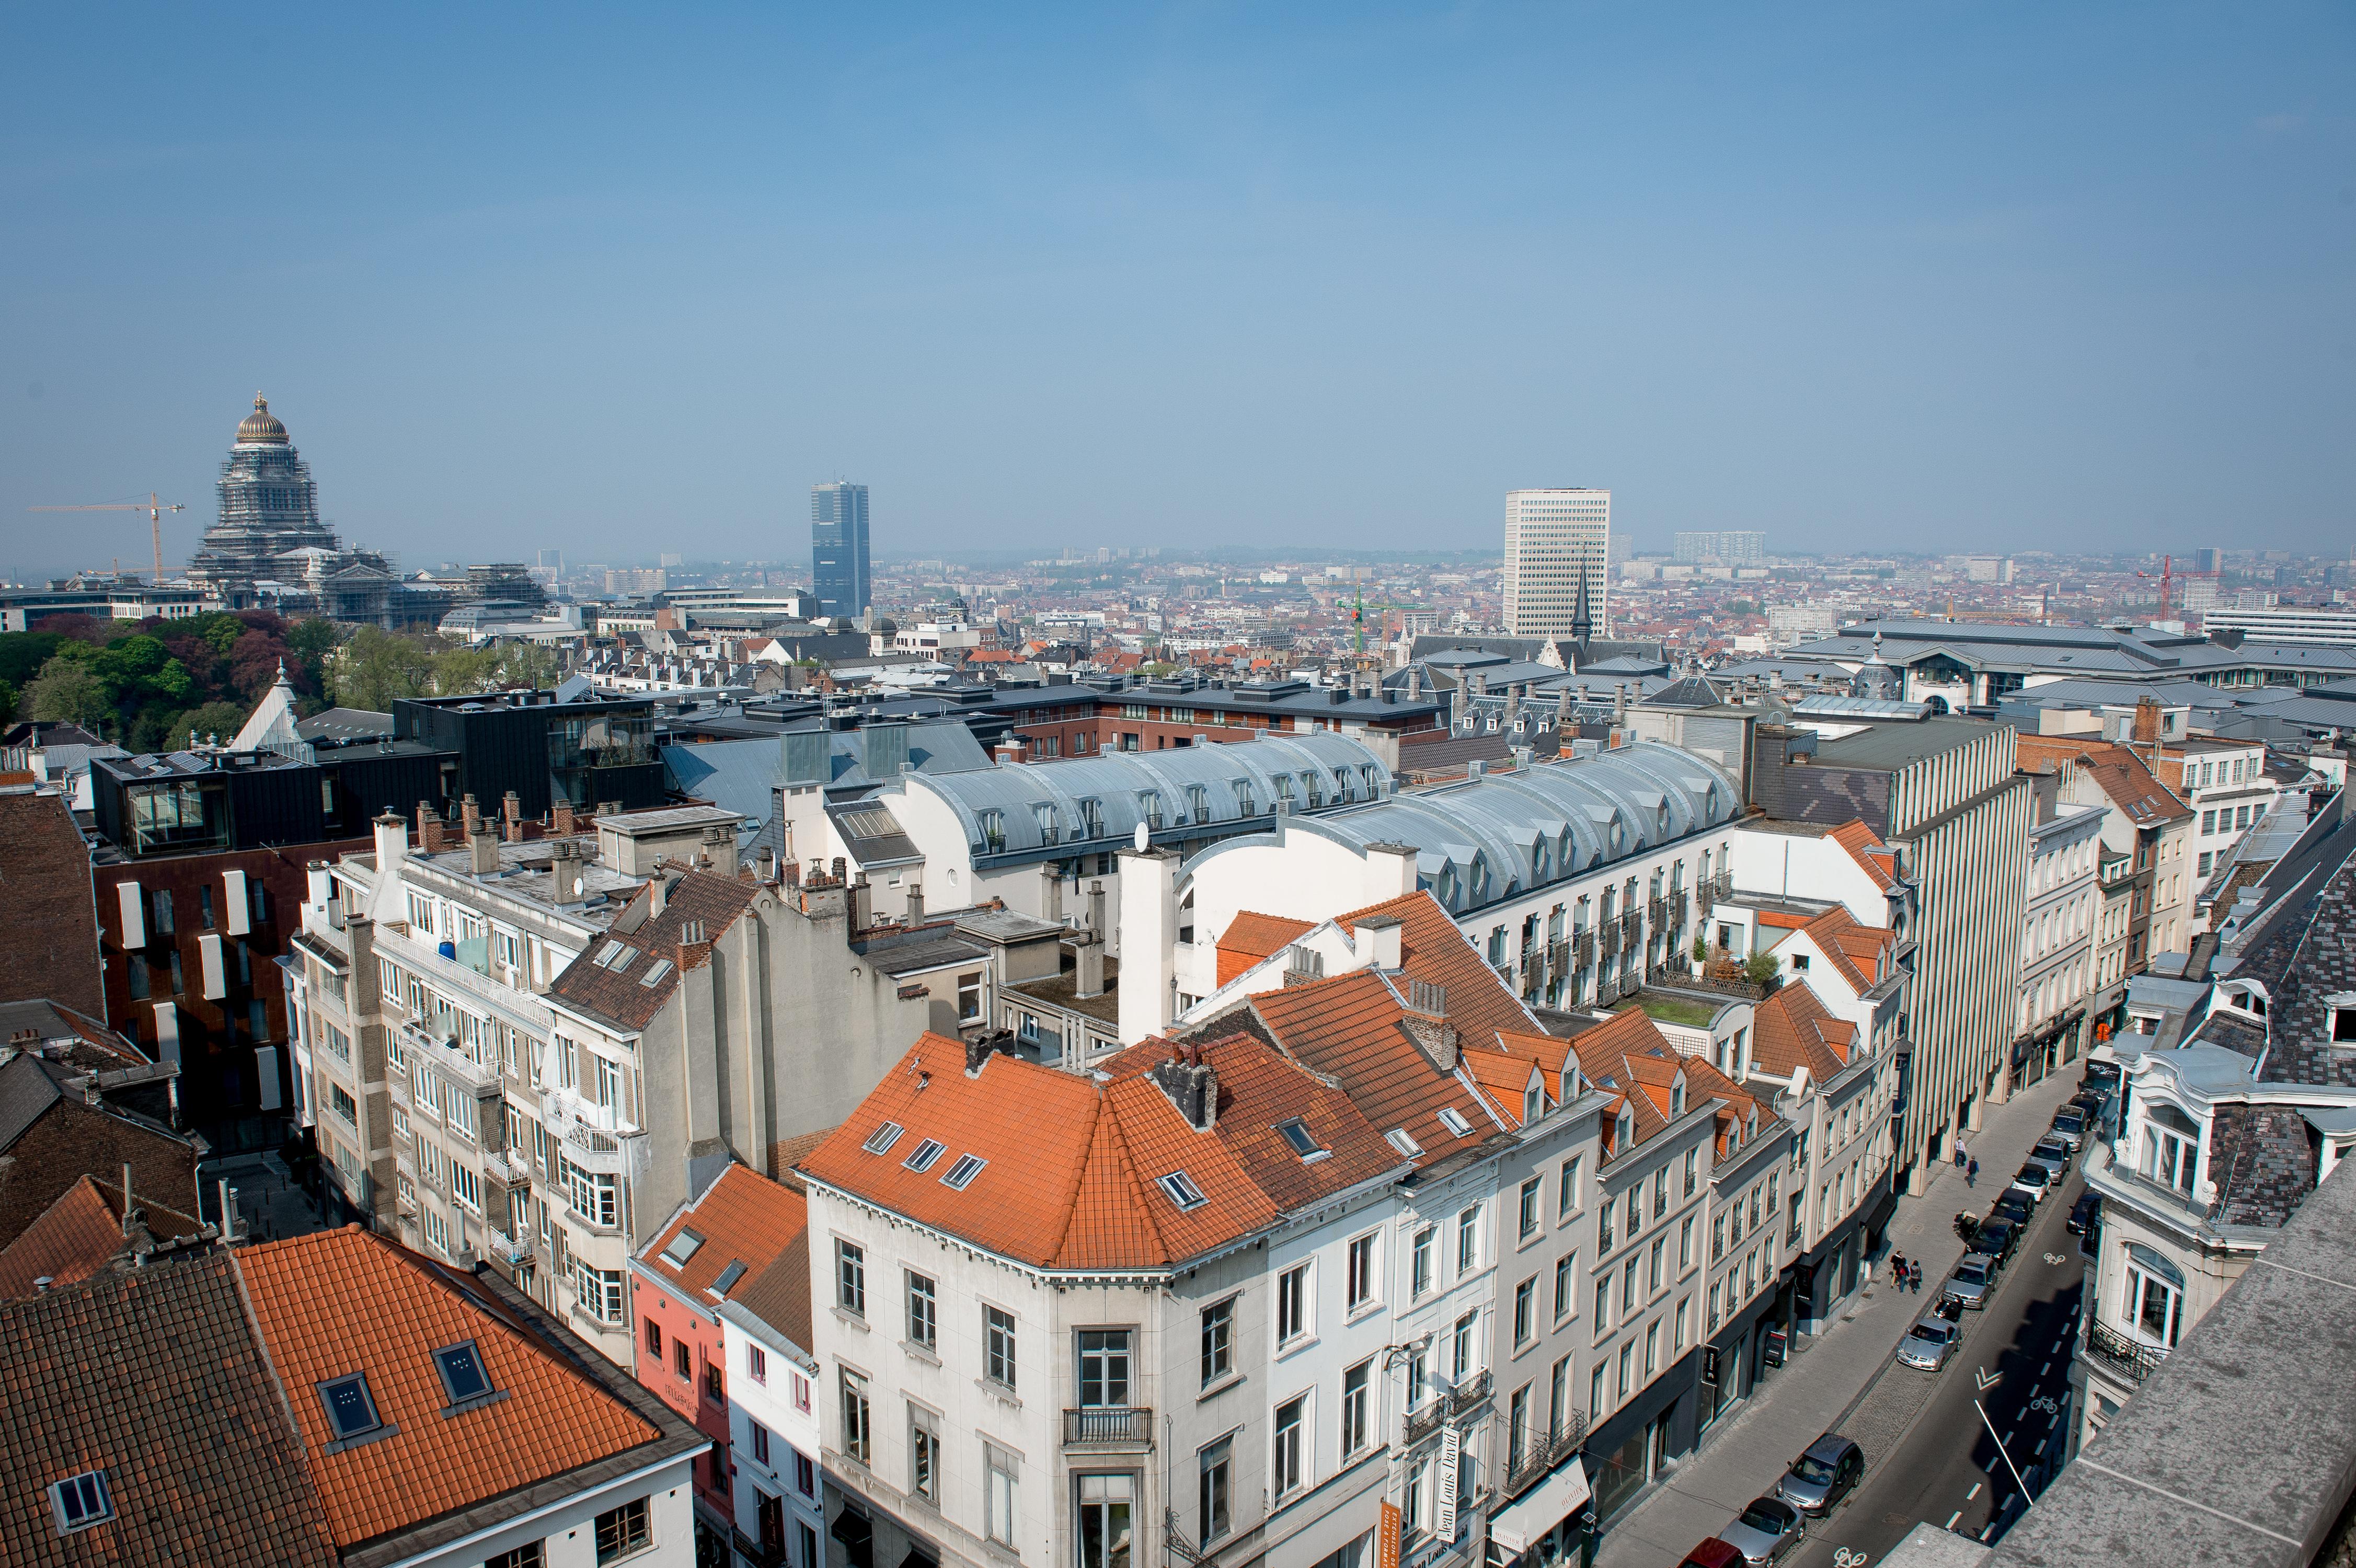 Hotel Chambord - Brussels - Belgium